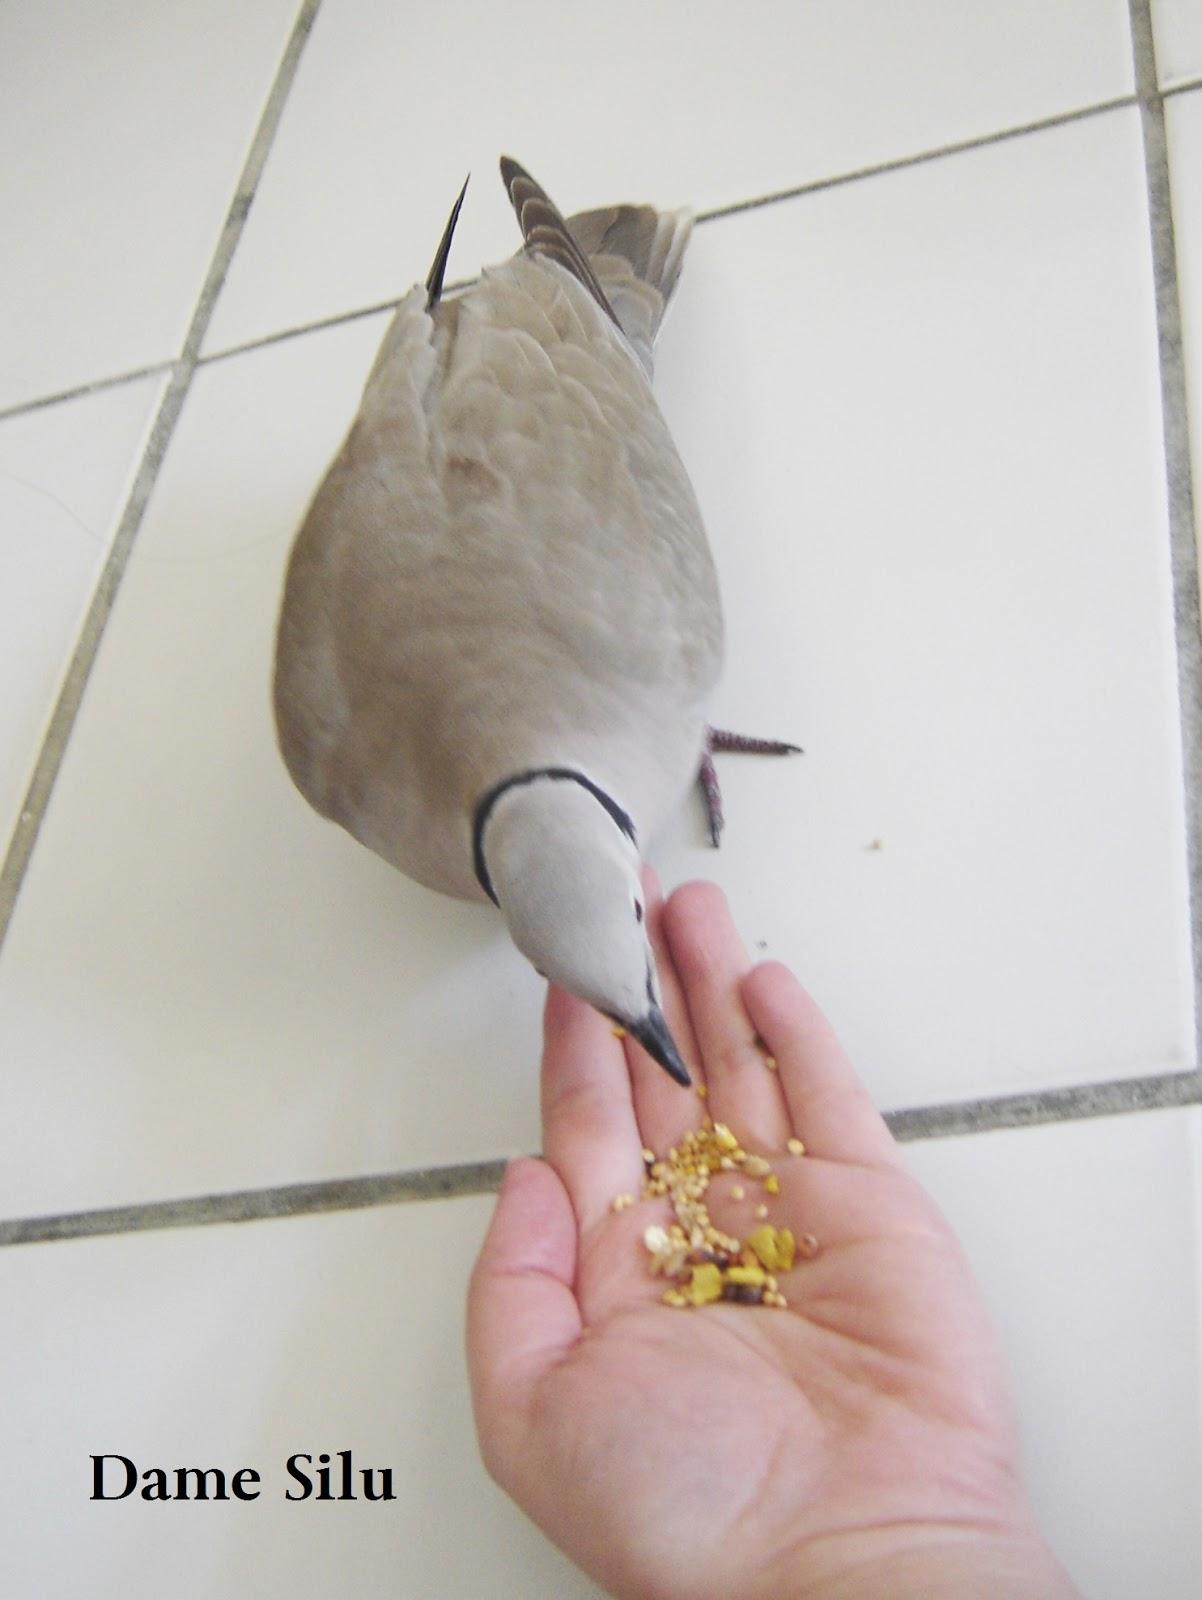 Eskorte i mange la